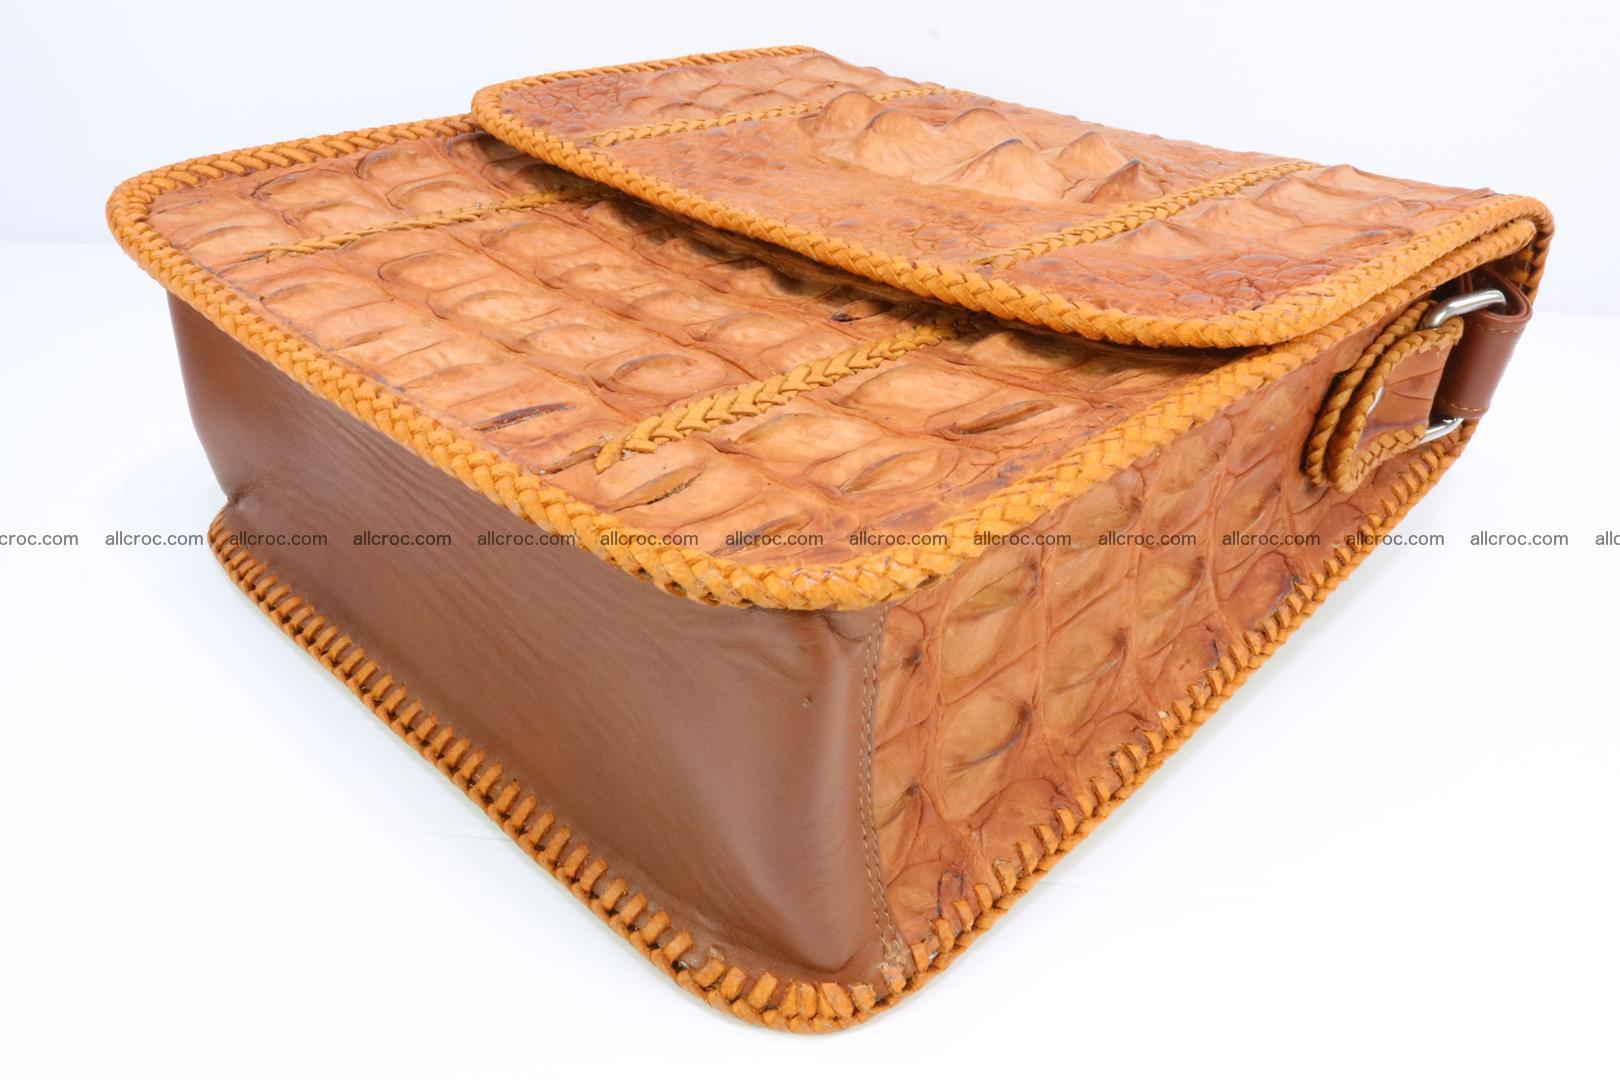 Сrocodile skin shoulder bag with braided edges 141 Foto 10